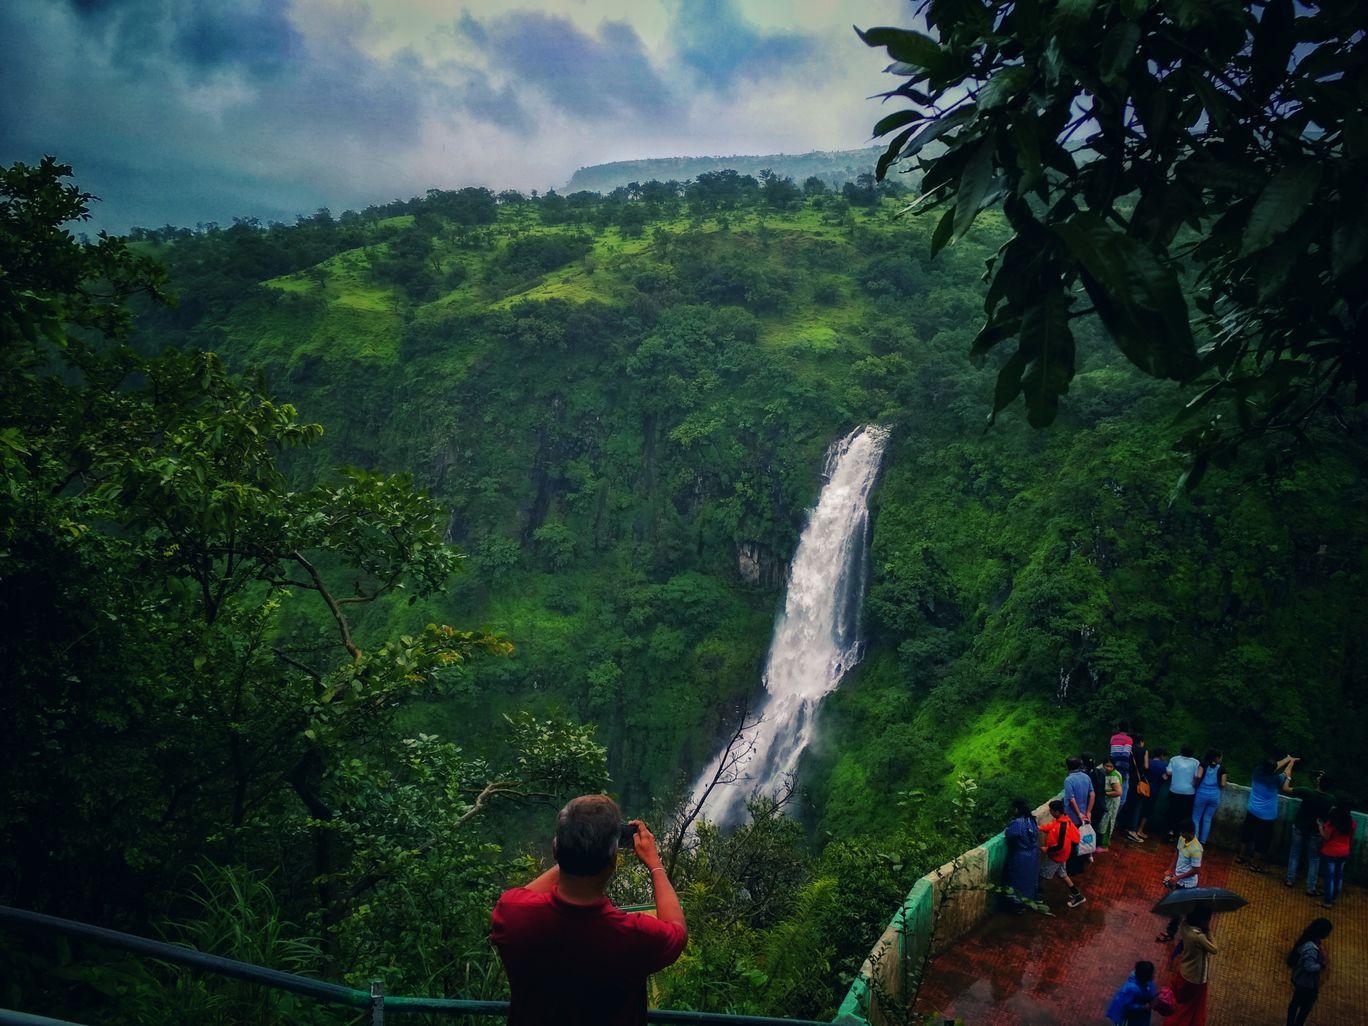 Photo of Thoseghar Waterfall By Shubham Patel